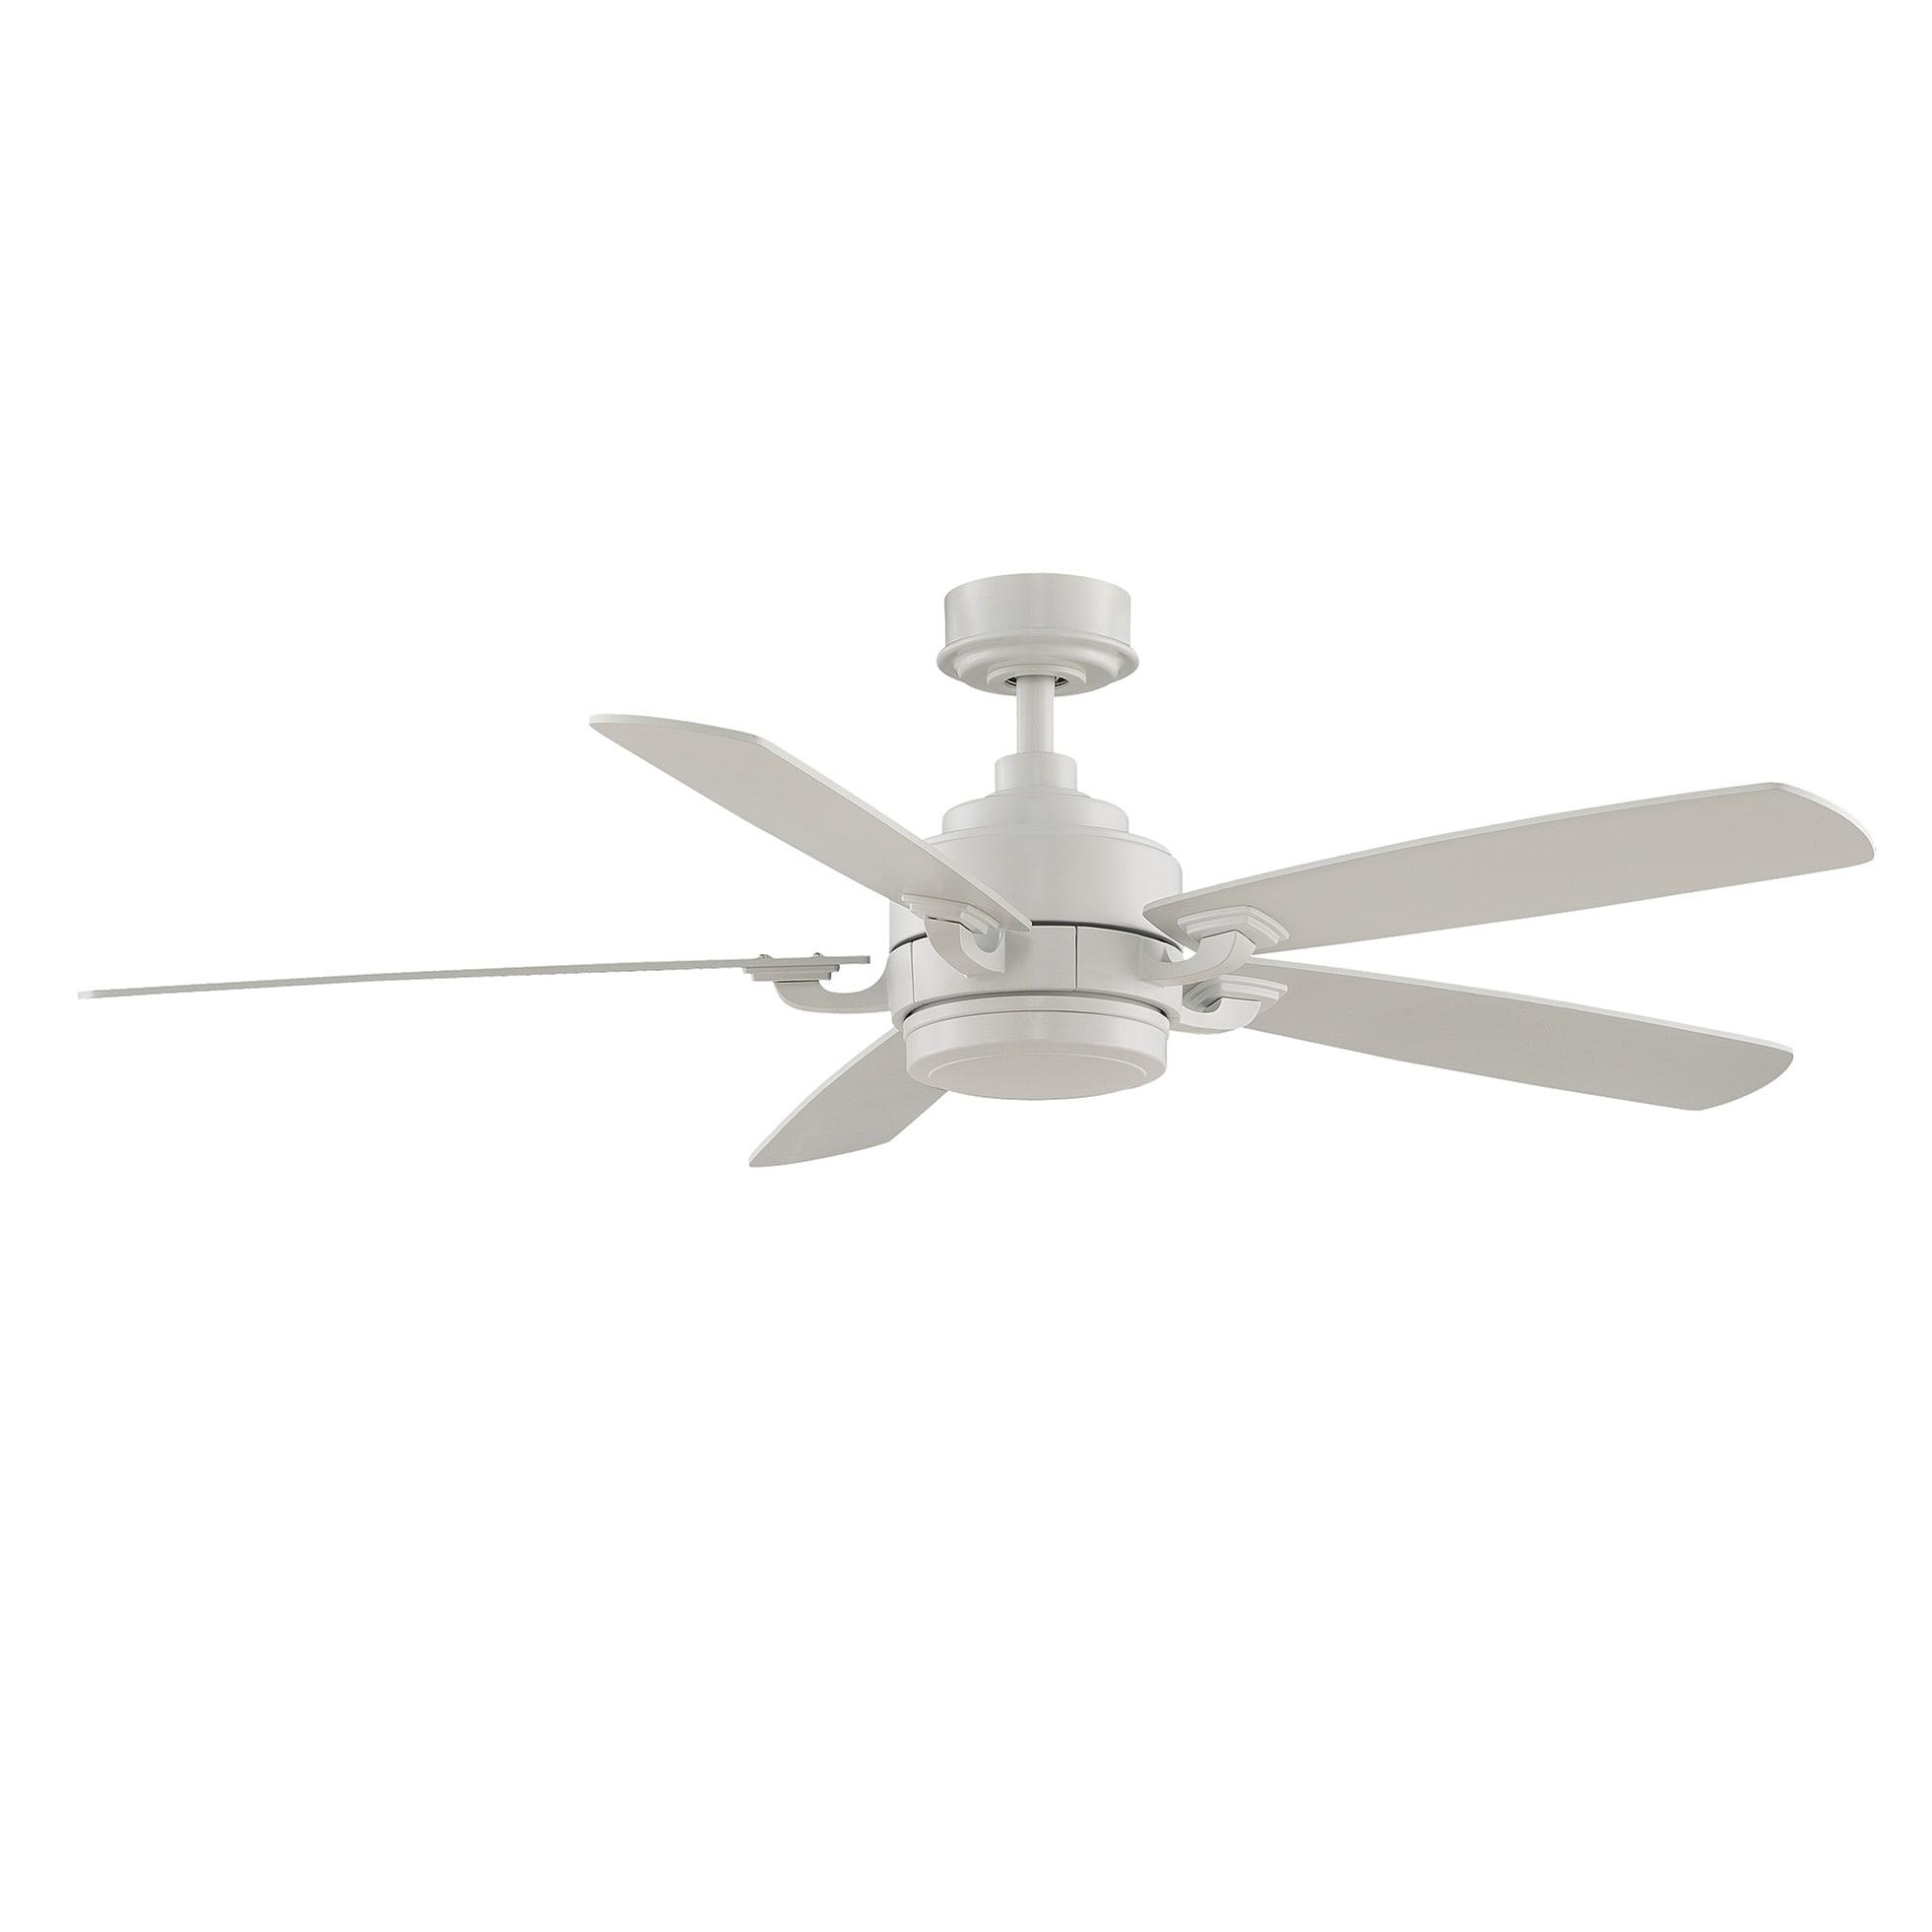 Fanimation Benito 52 inch Matte White 1 light Ceiling Fan Free